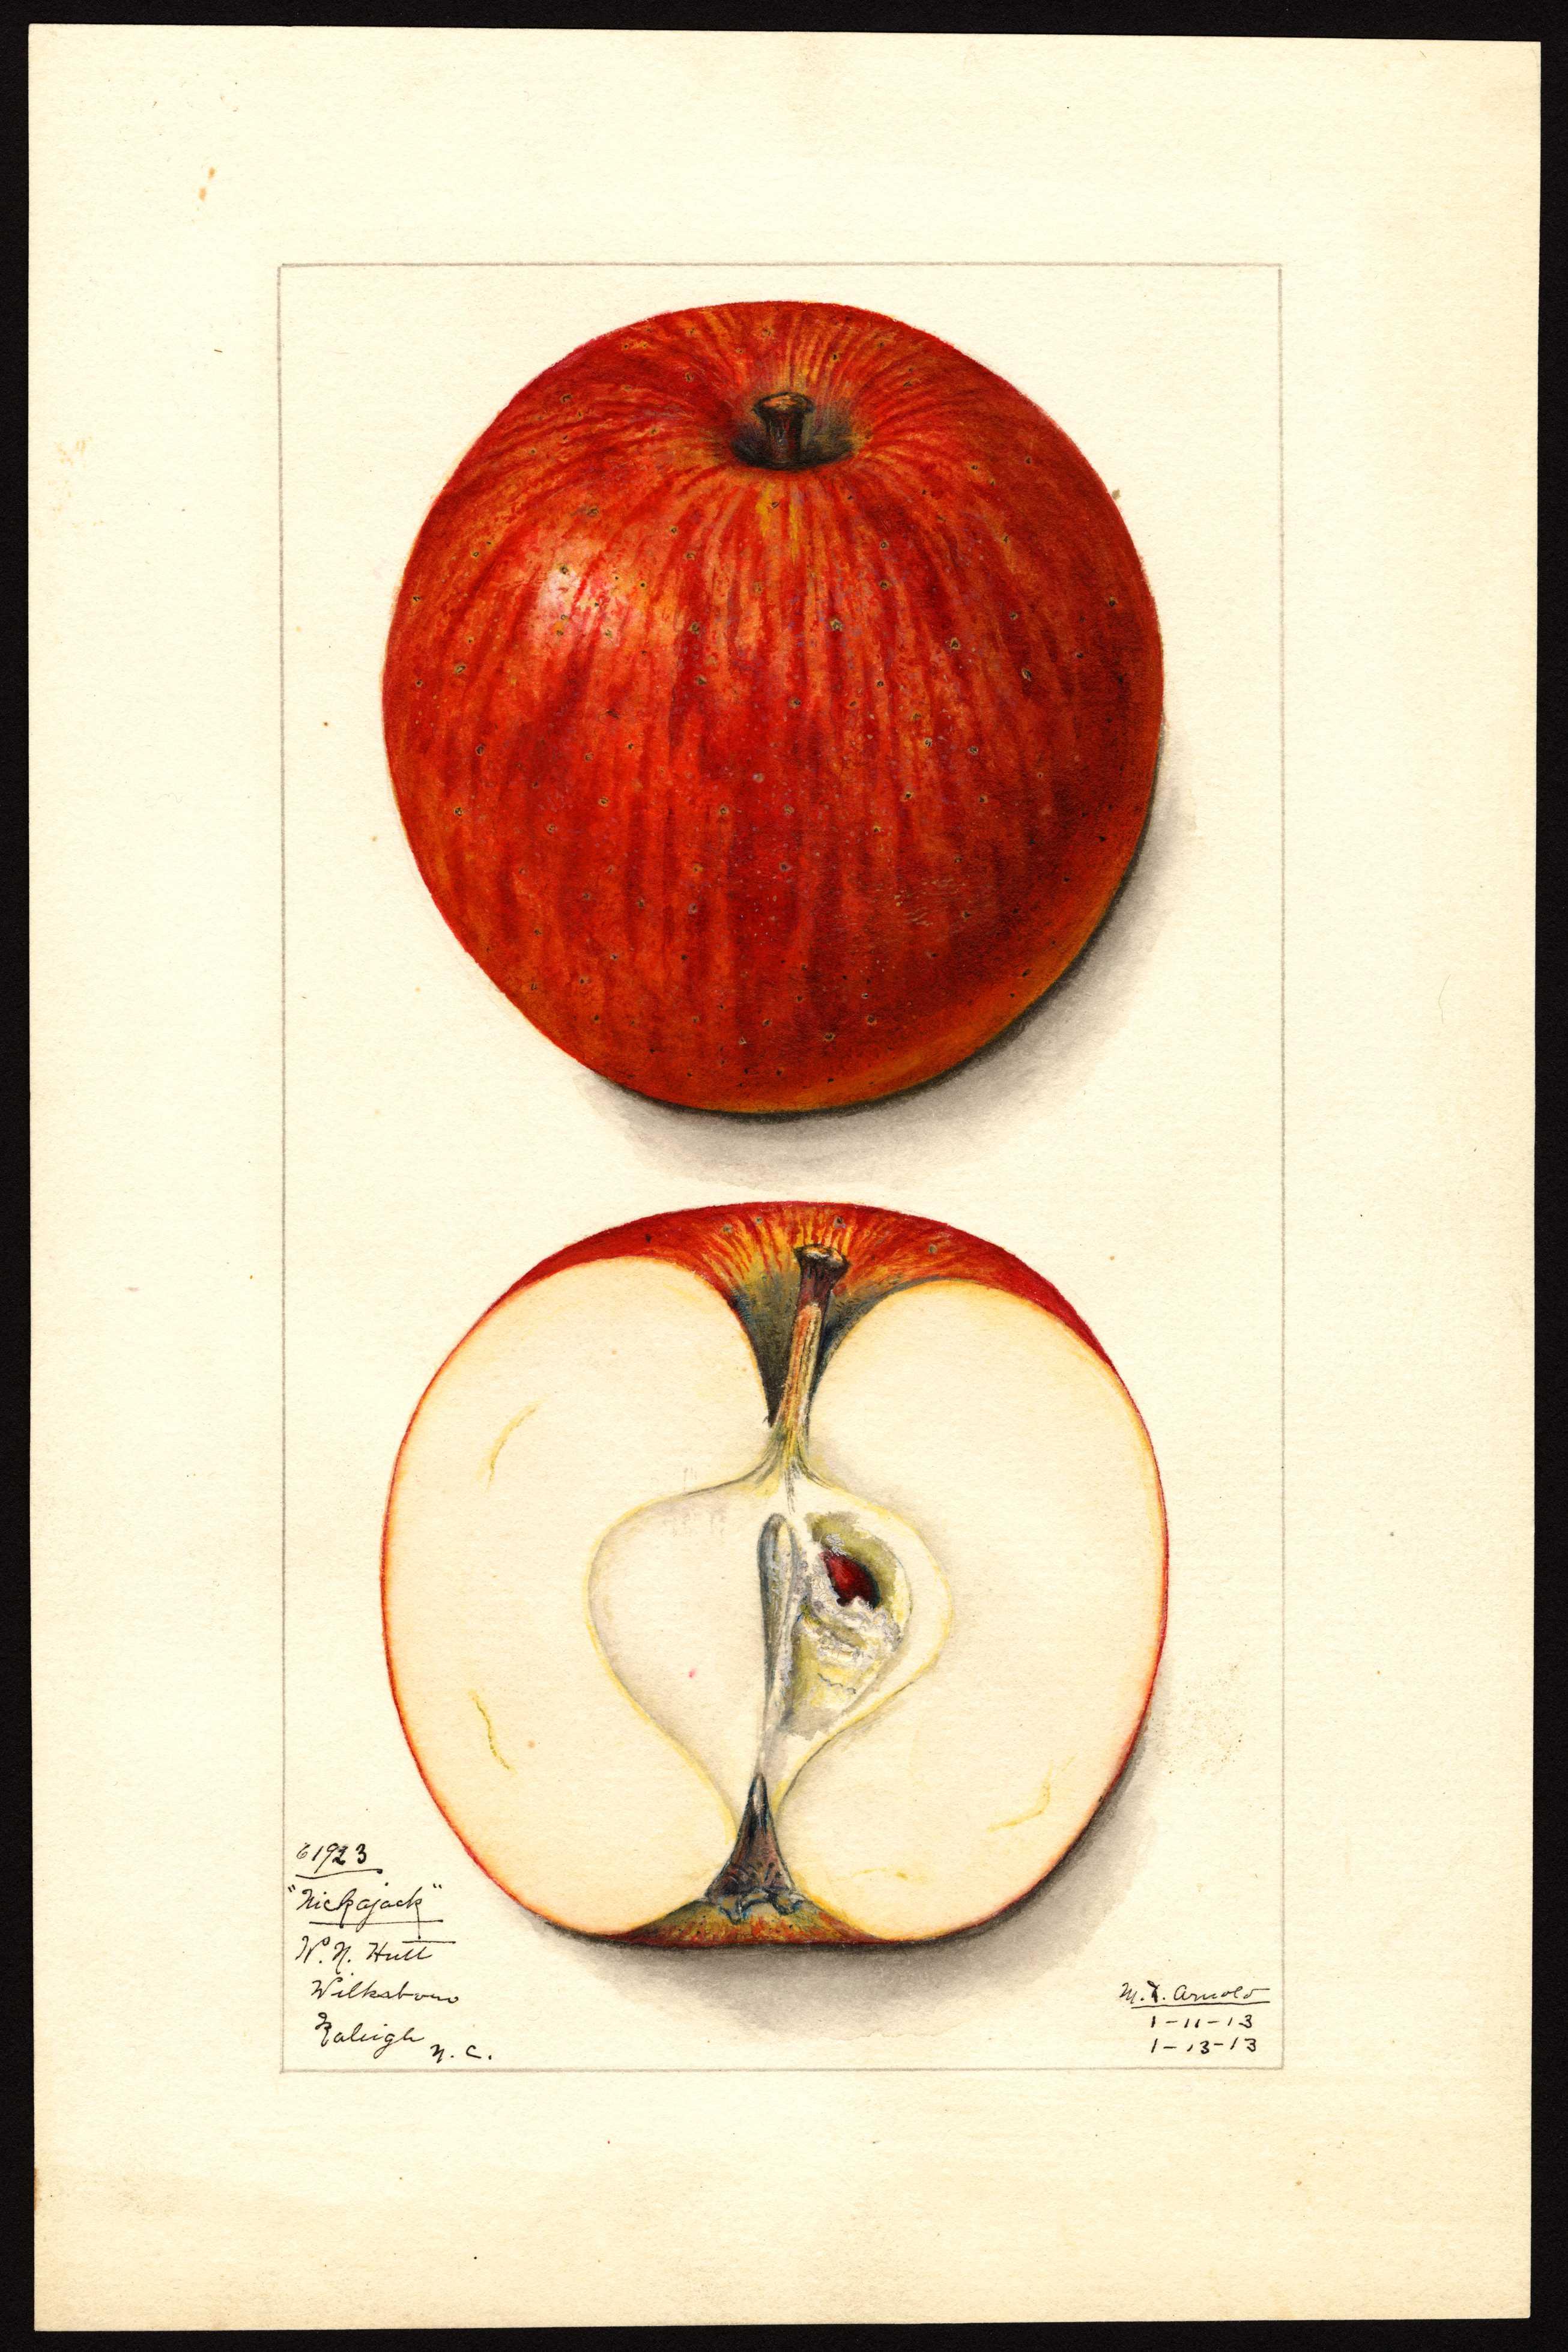 round red apple with darker red stripes